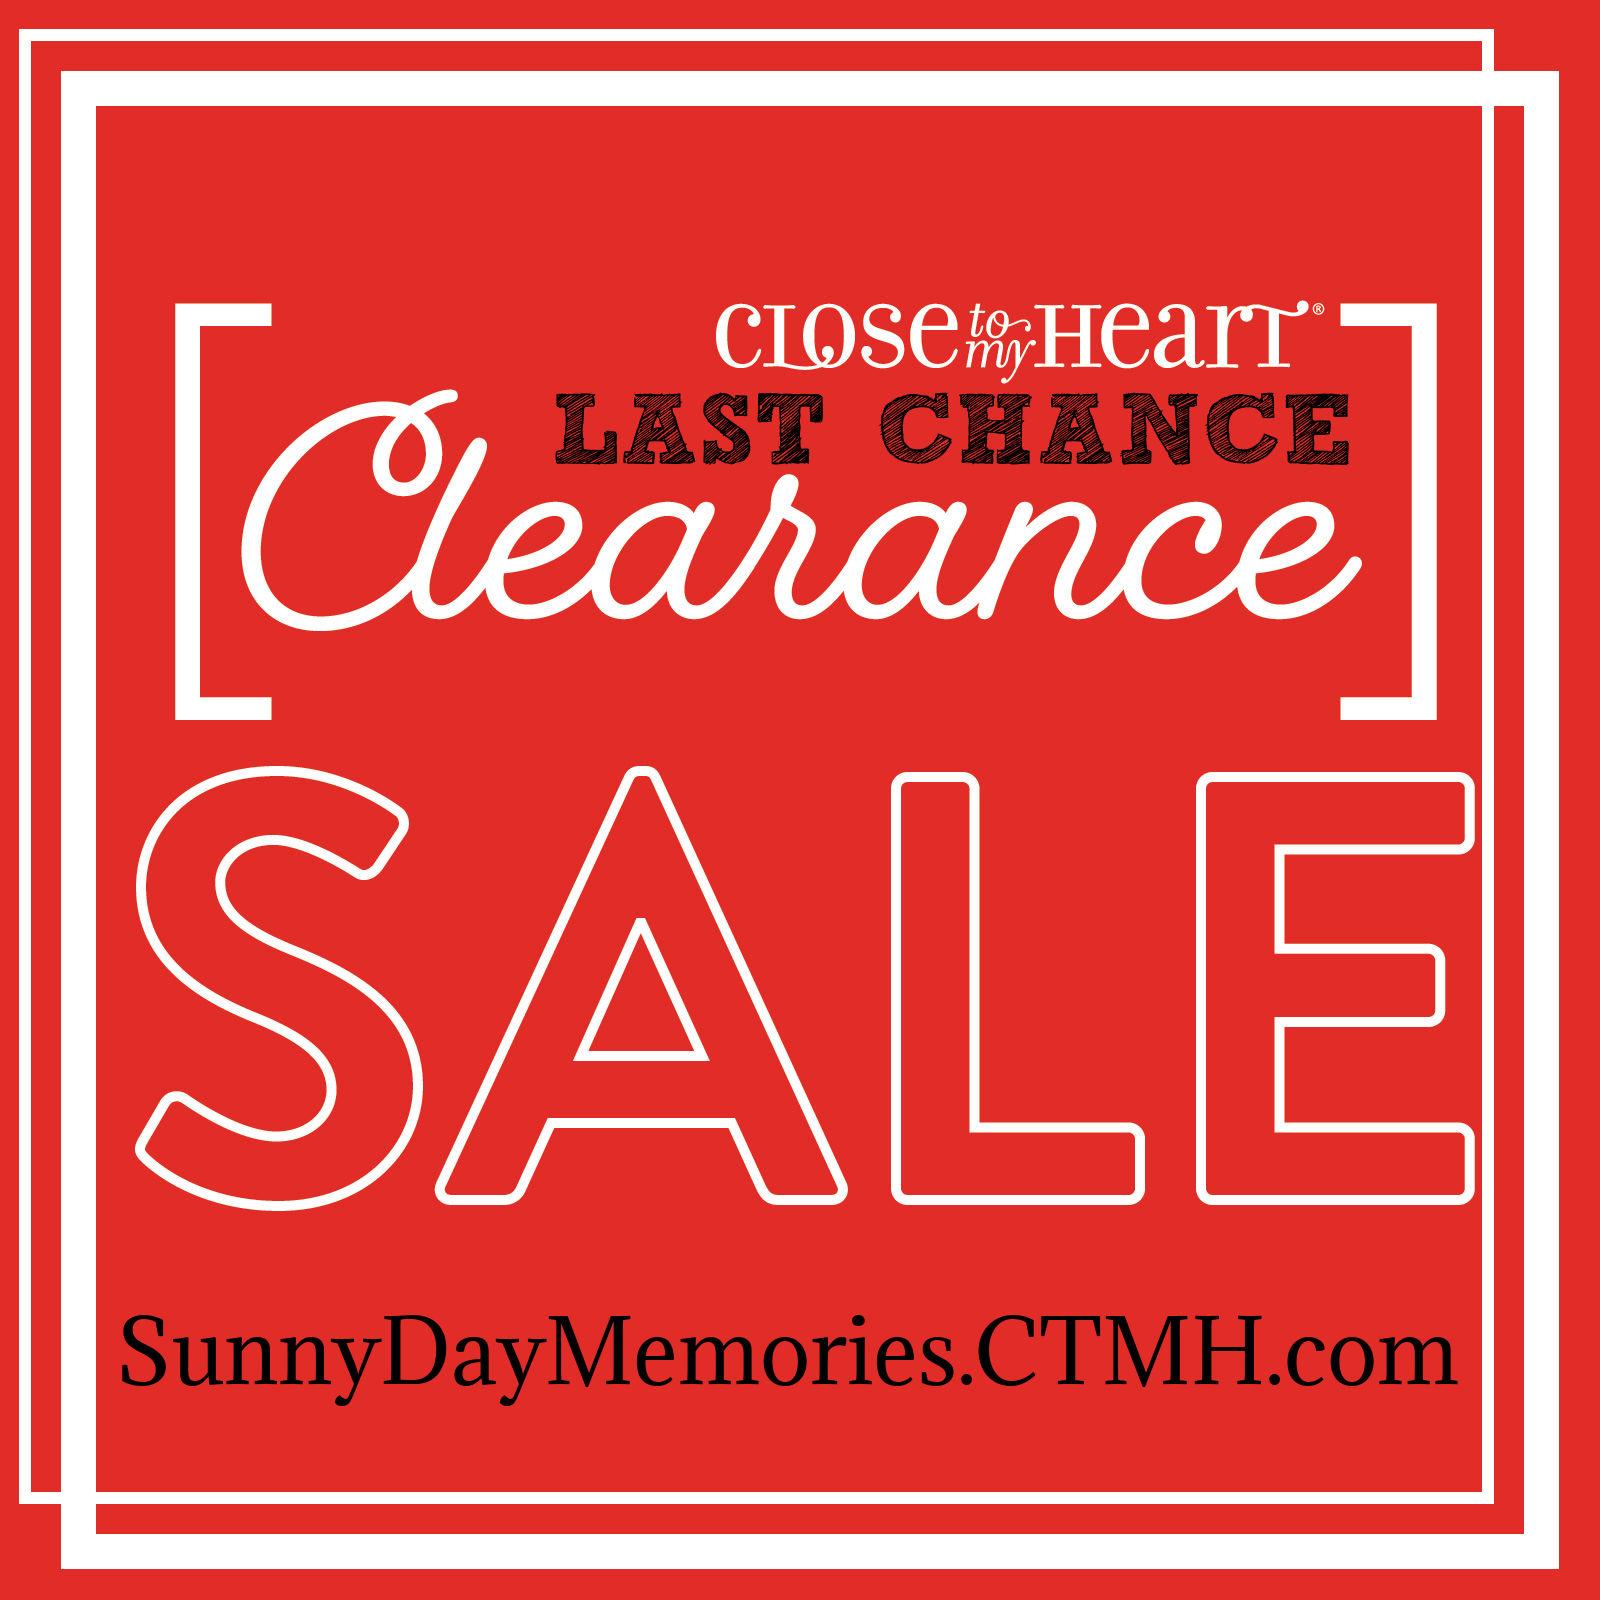 CTMH Last Chance Clearance Sale